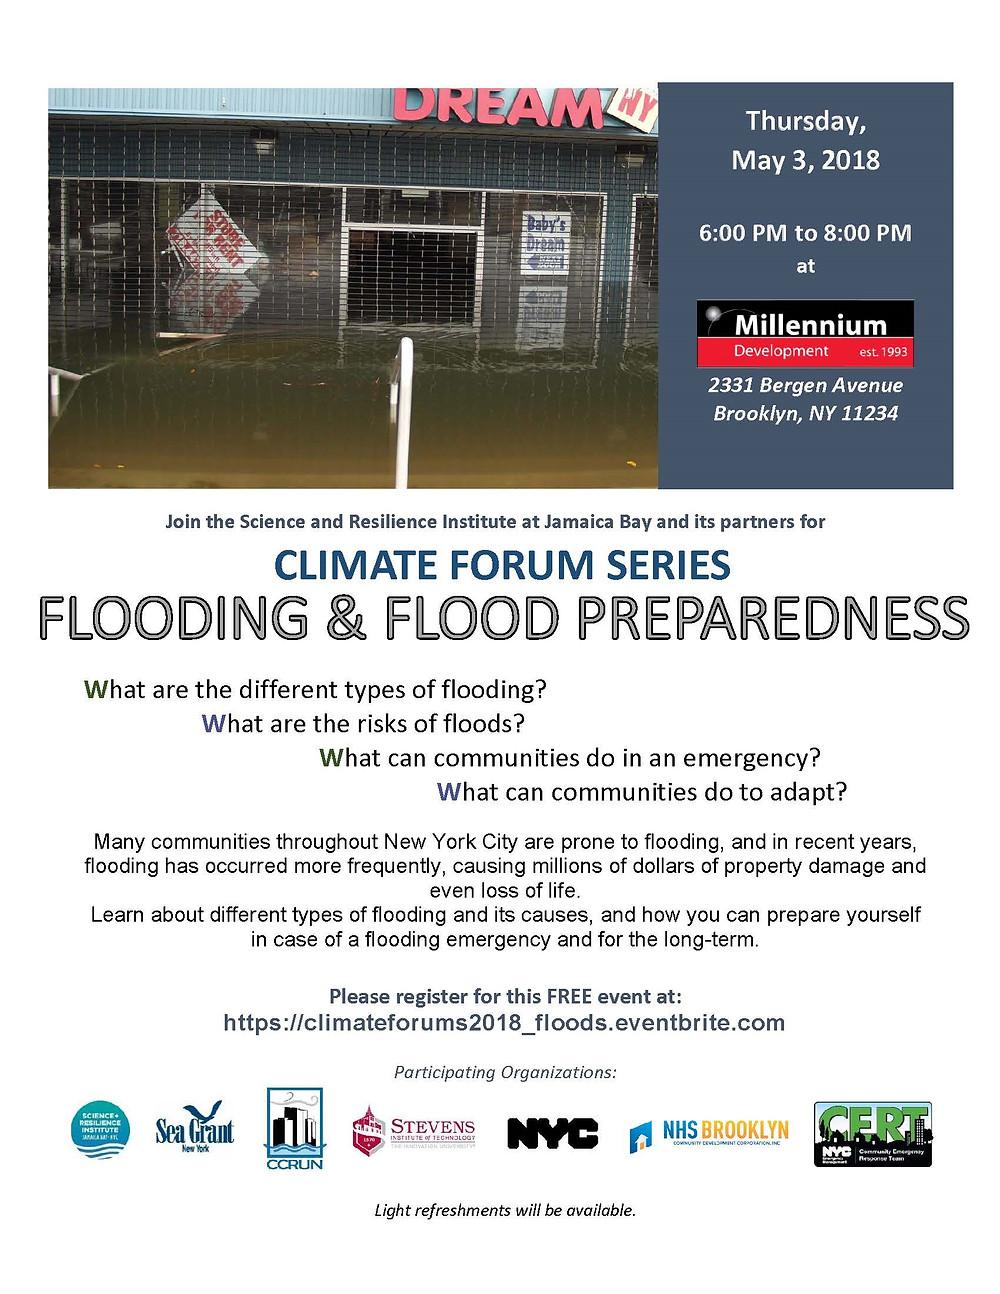 flood, flooding, flood preparedness, FEMA, flood insurance, 11234, Brooklyn, NHS, NHS Brooklyn, Millennium, Bergen Beach, 2018, resiliency, Sandy, hurricane